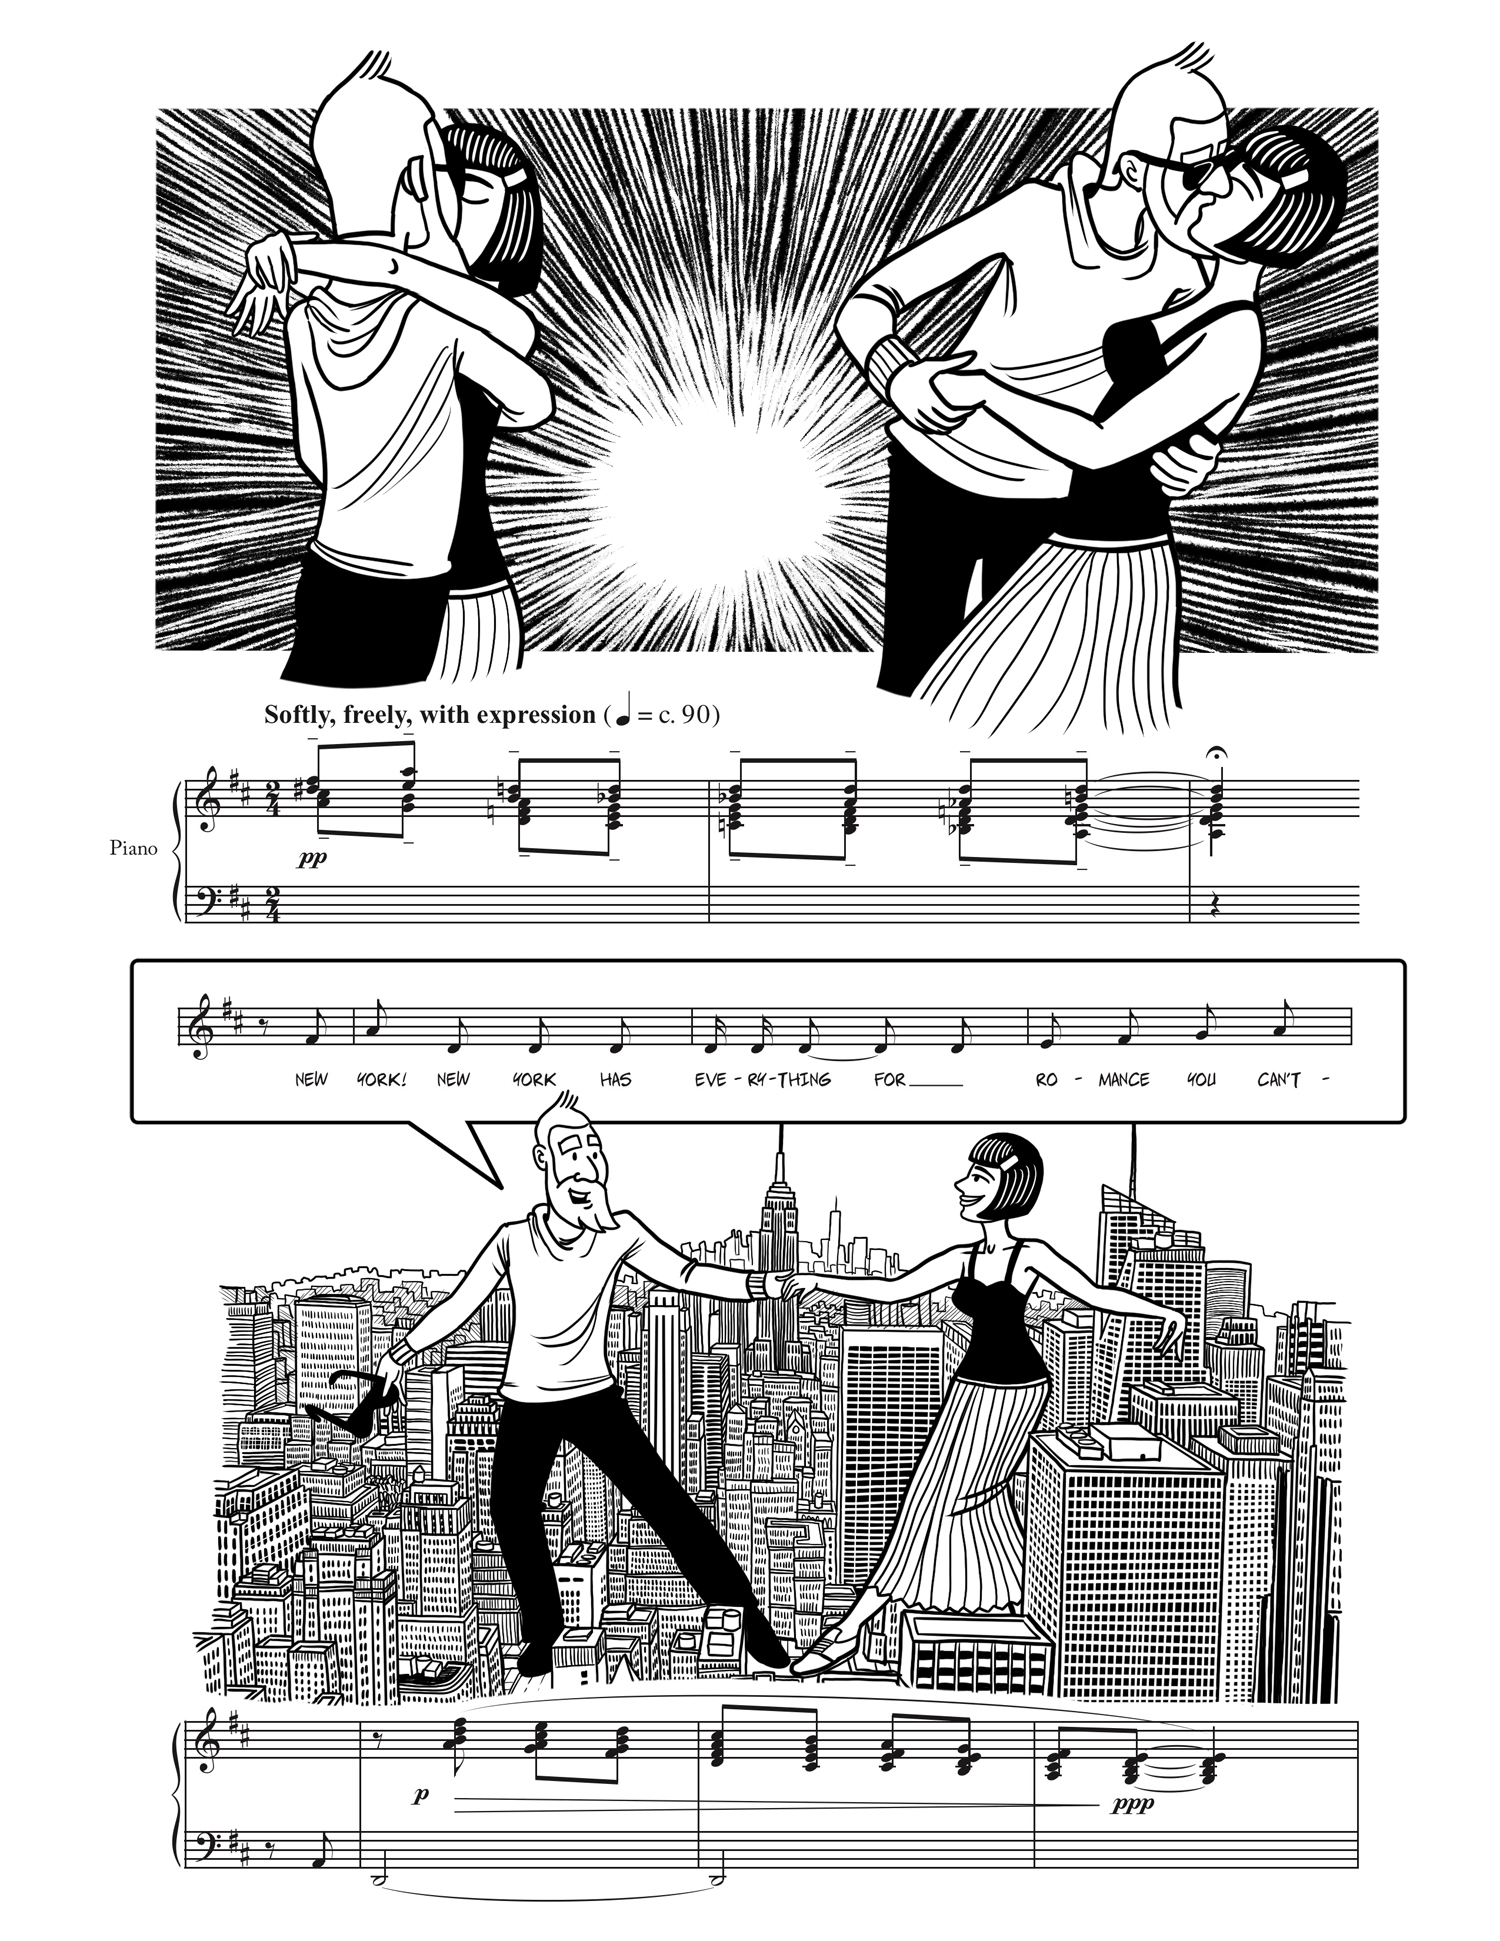 PAGE-349.jpg